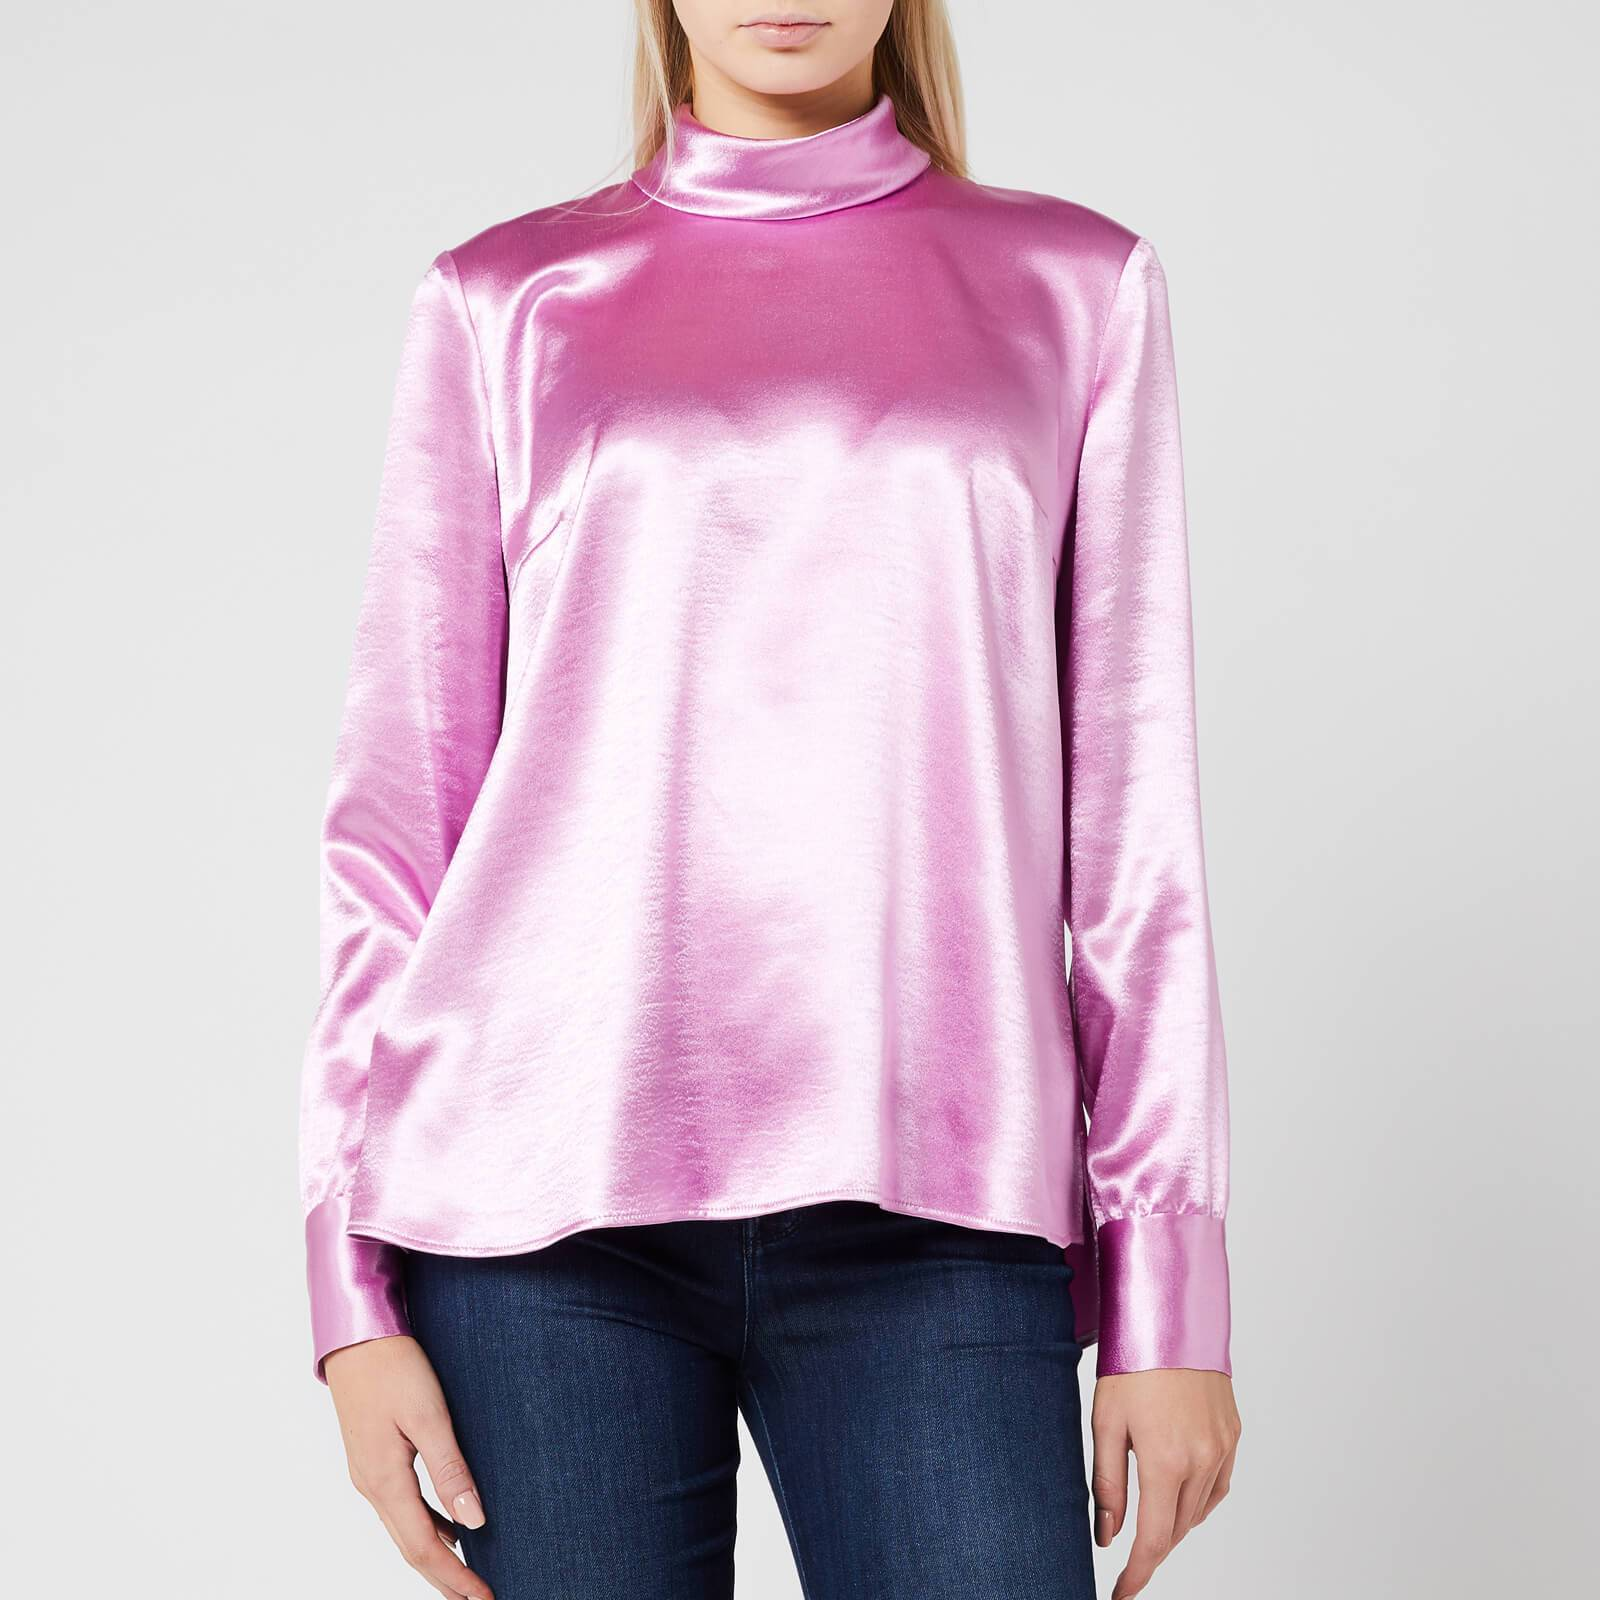 Hugo Boss Women's Cayanas Satin Long Sleeve Top - Light/Pastel Purple - UK 8